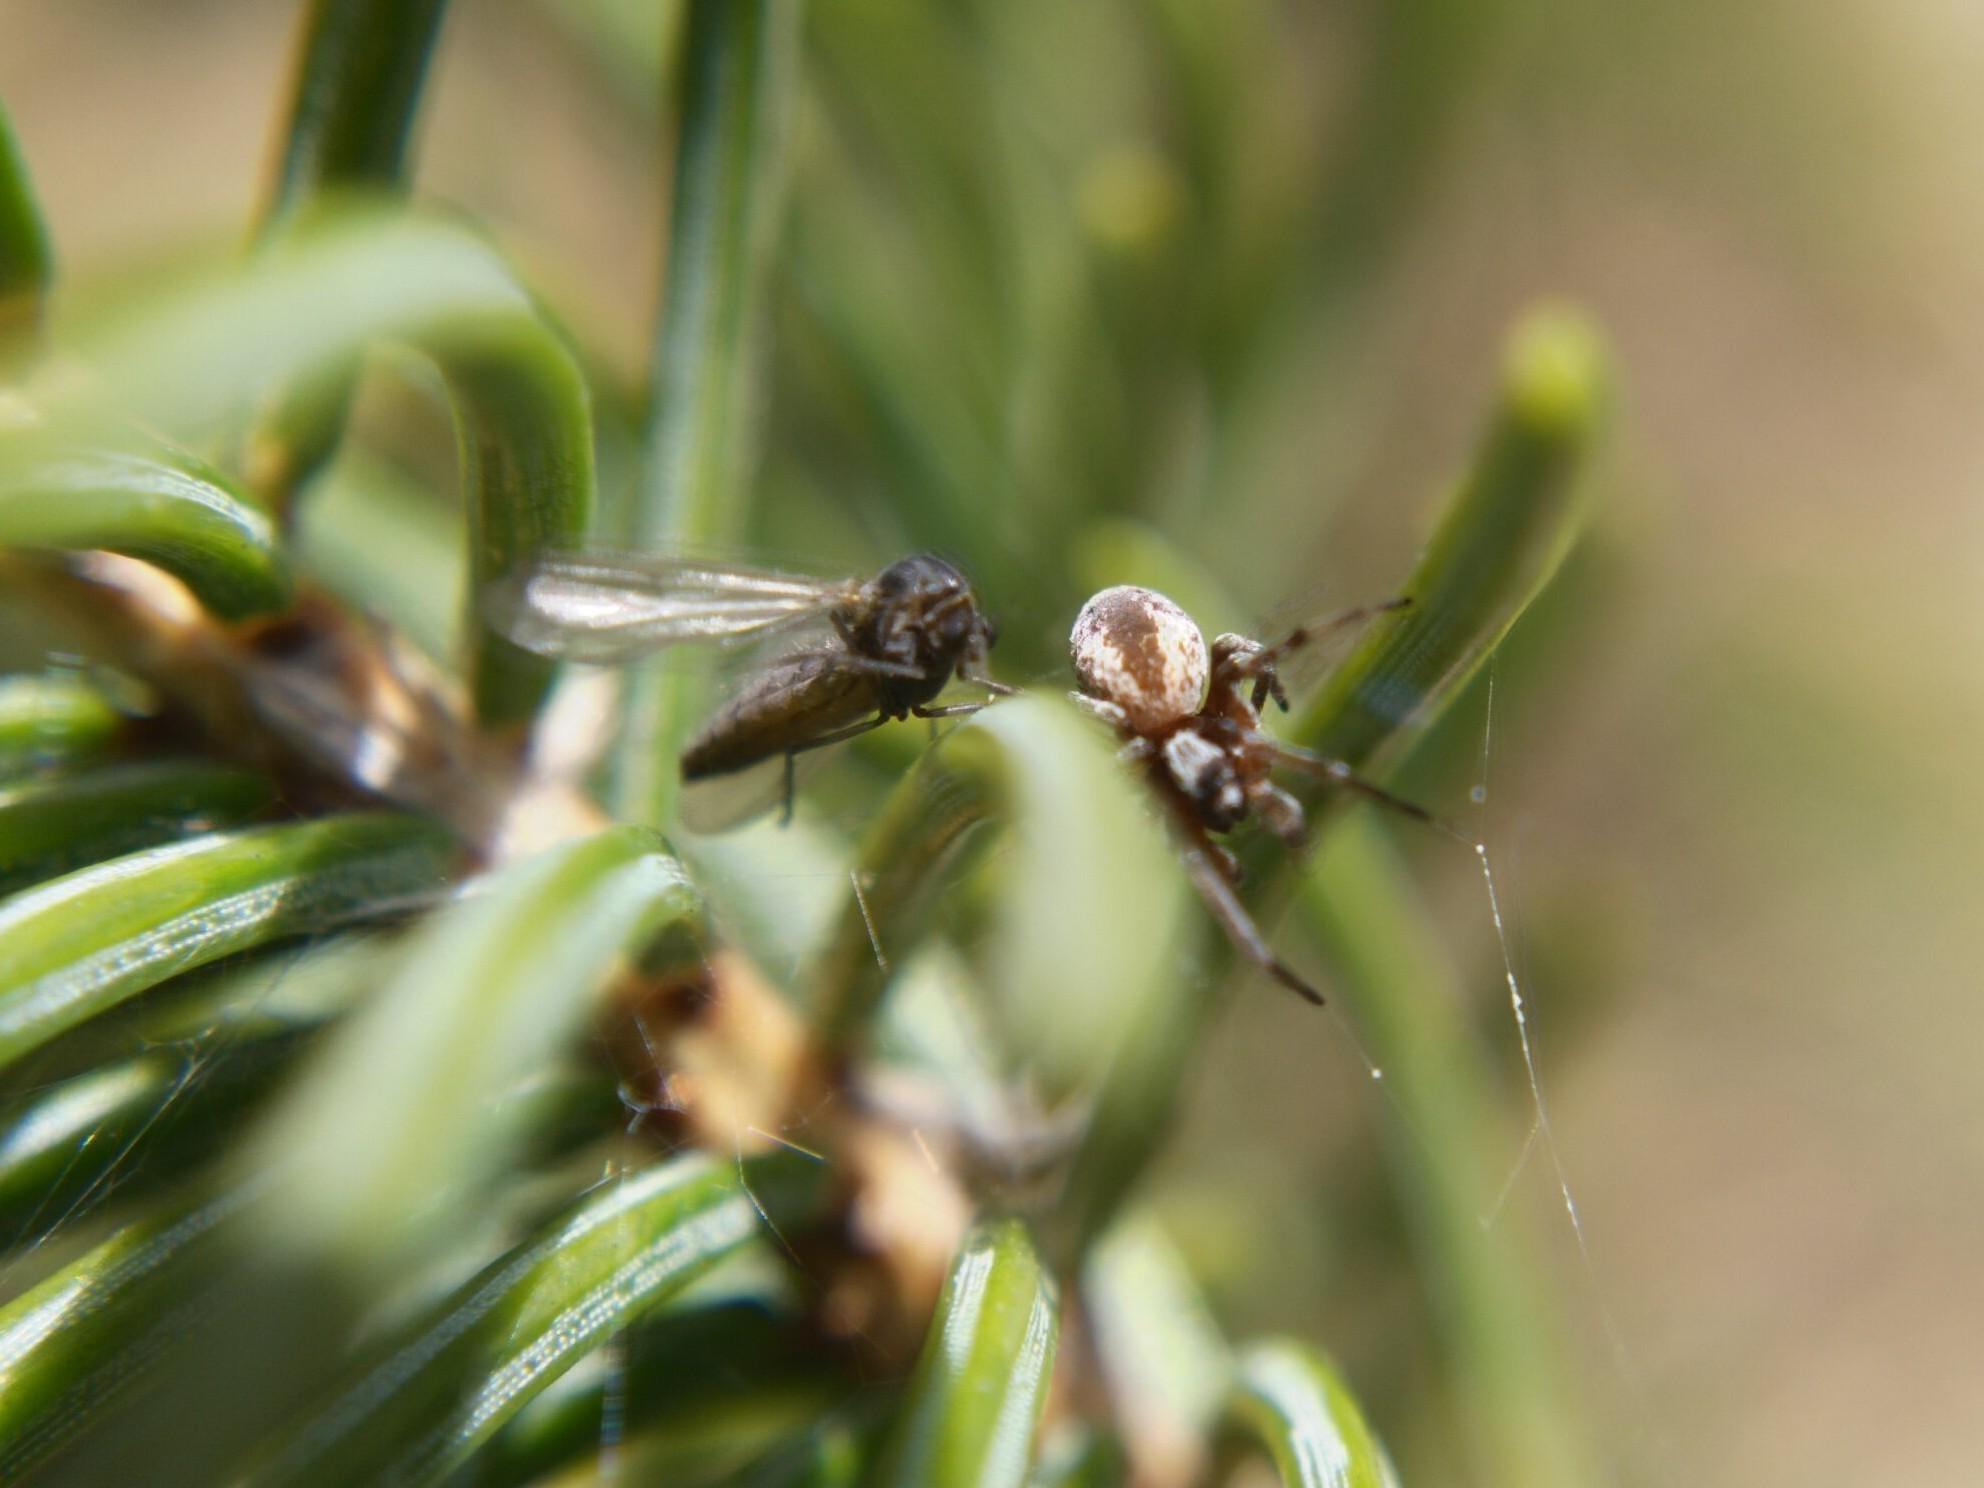 Mesh-web weaver leaving its prey